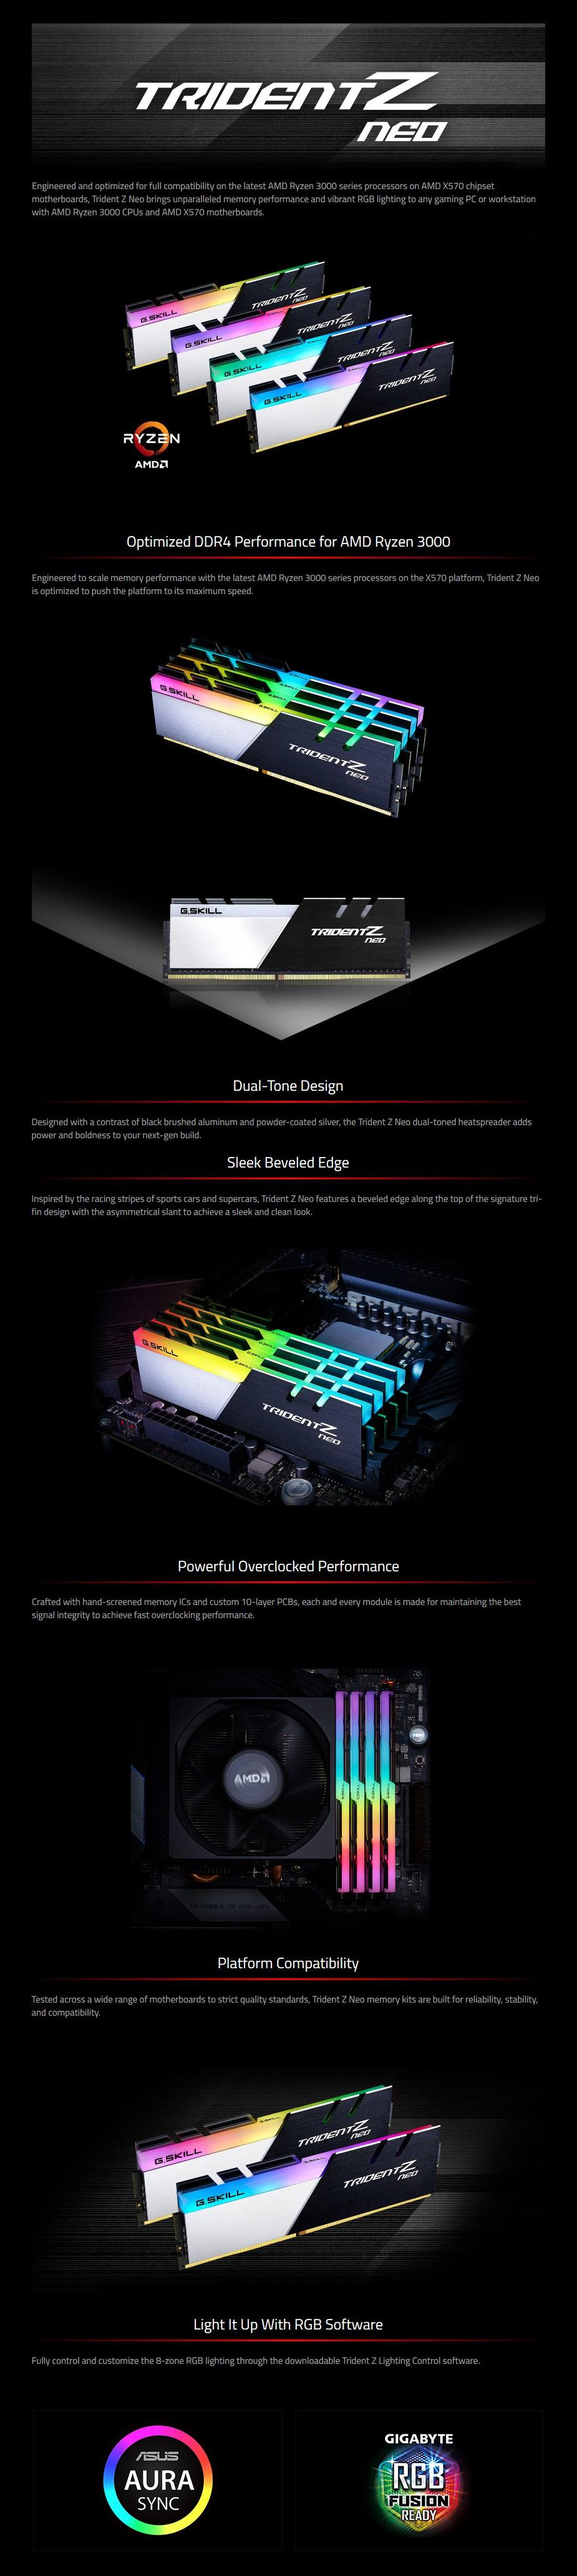 G.Skill Trident Z Neo RGB 32GB (2x 16GB) DDR4 3600MHz Memory - 16-16-16-36 - Overview 1